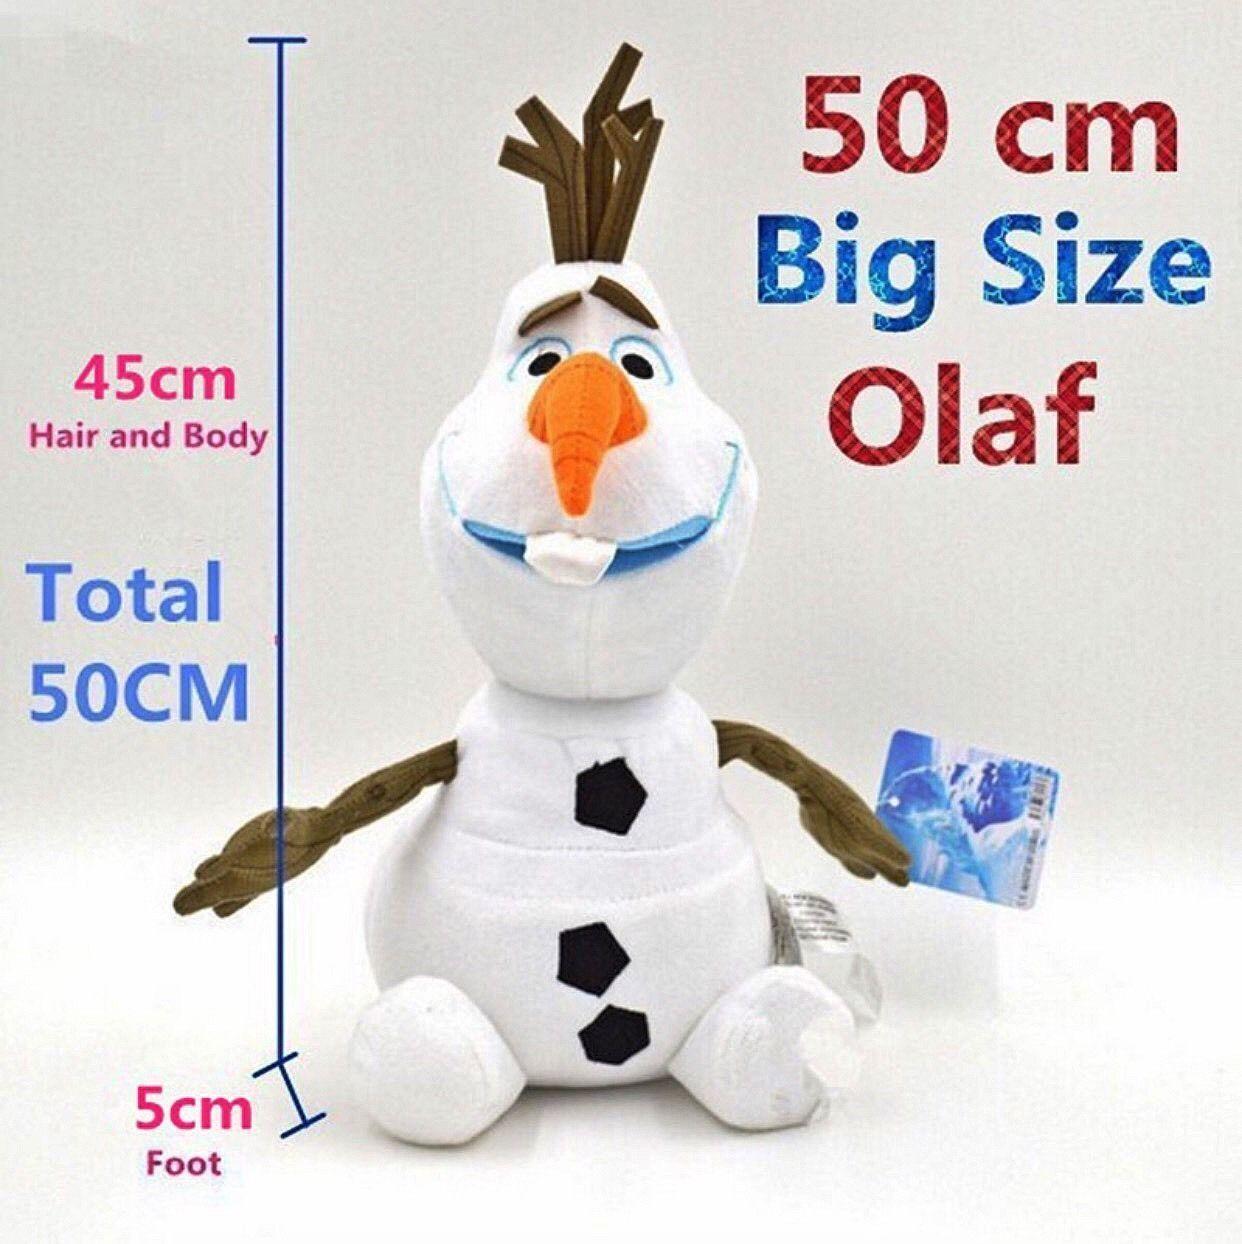 Store 50cm Olaf Snowman Plush Fylld leksak Doll (19tum) NY